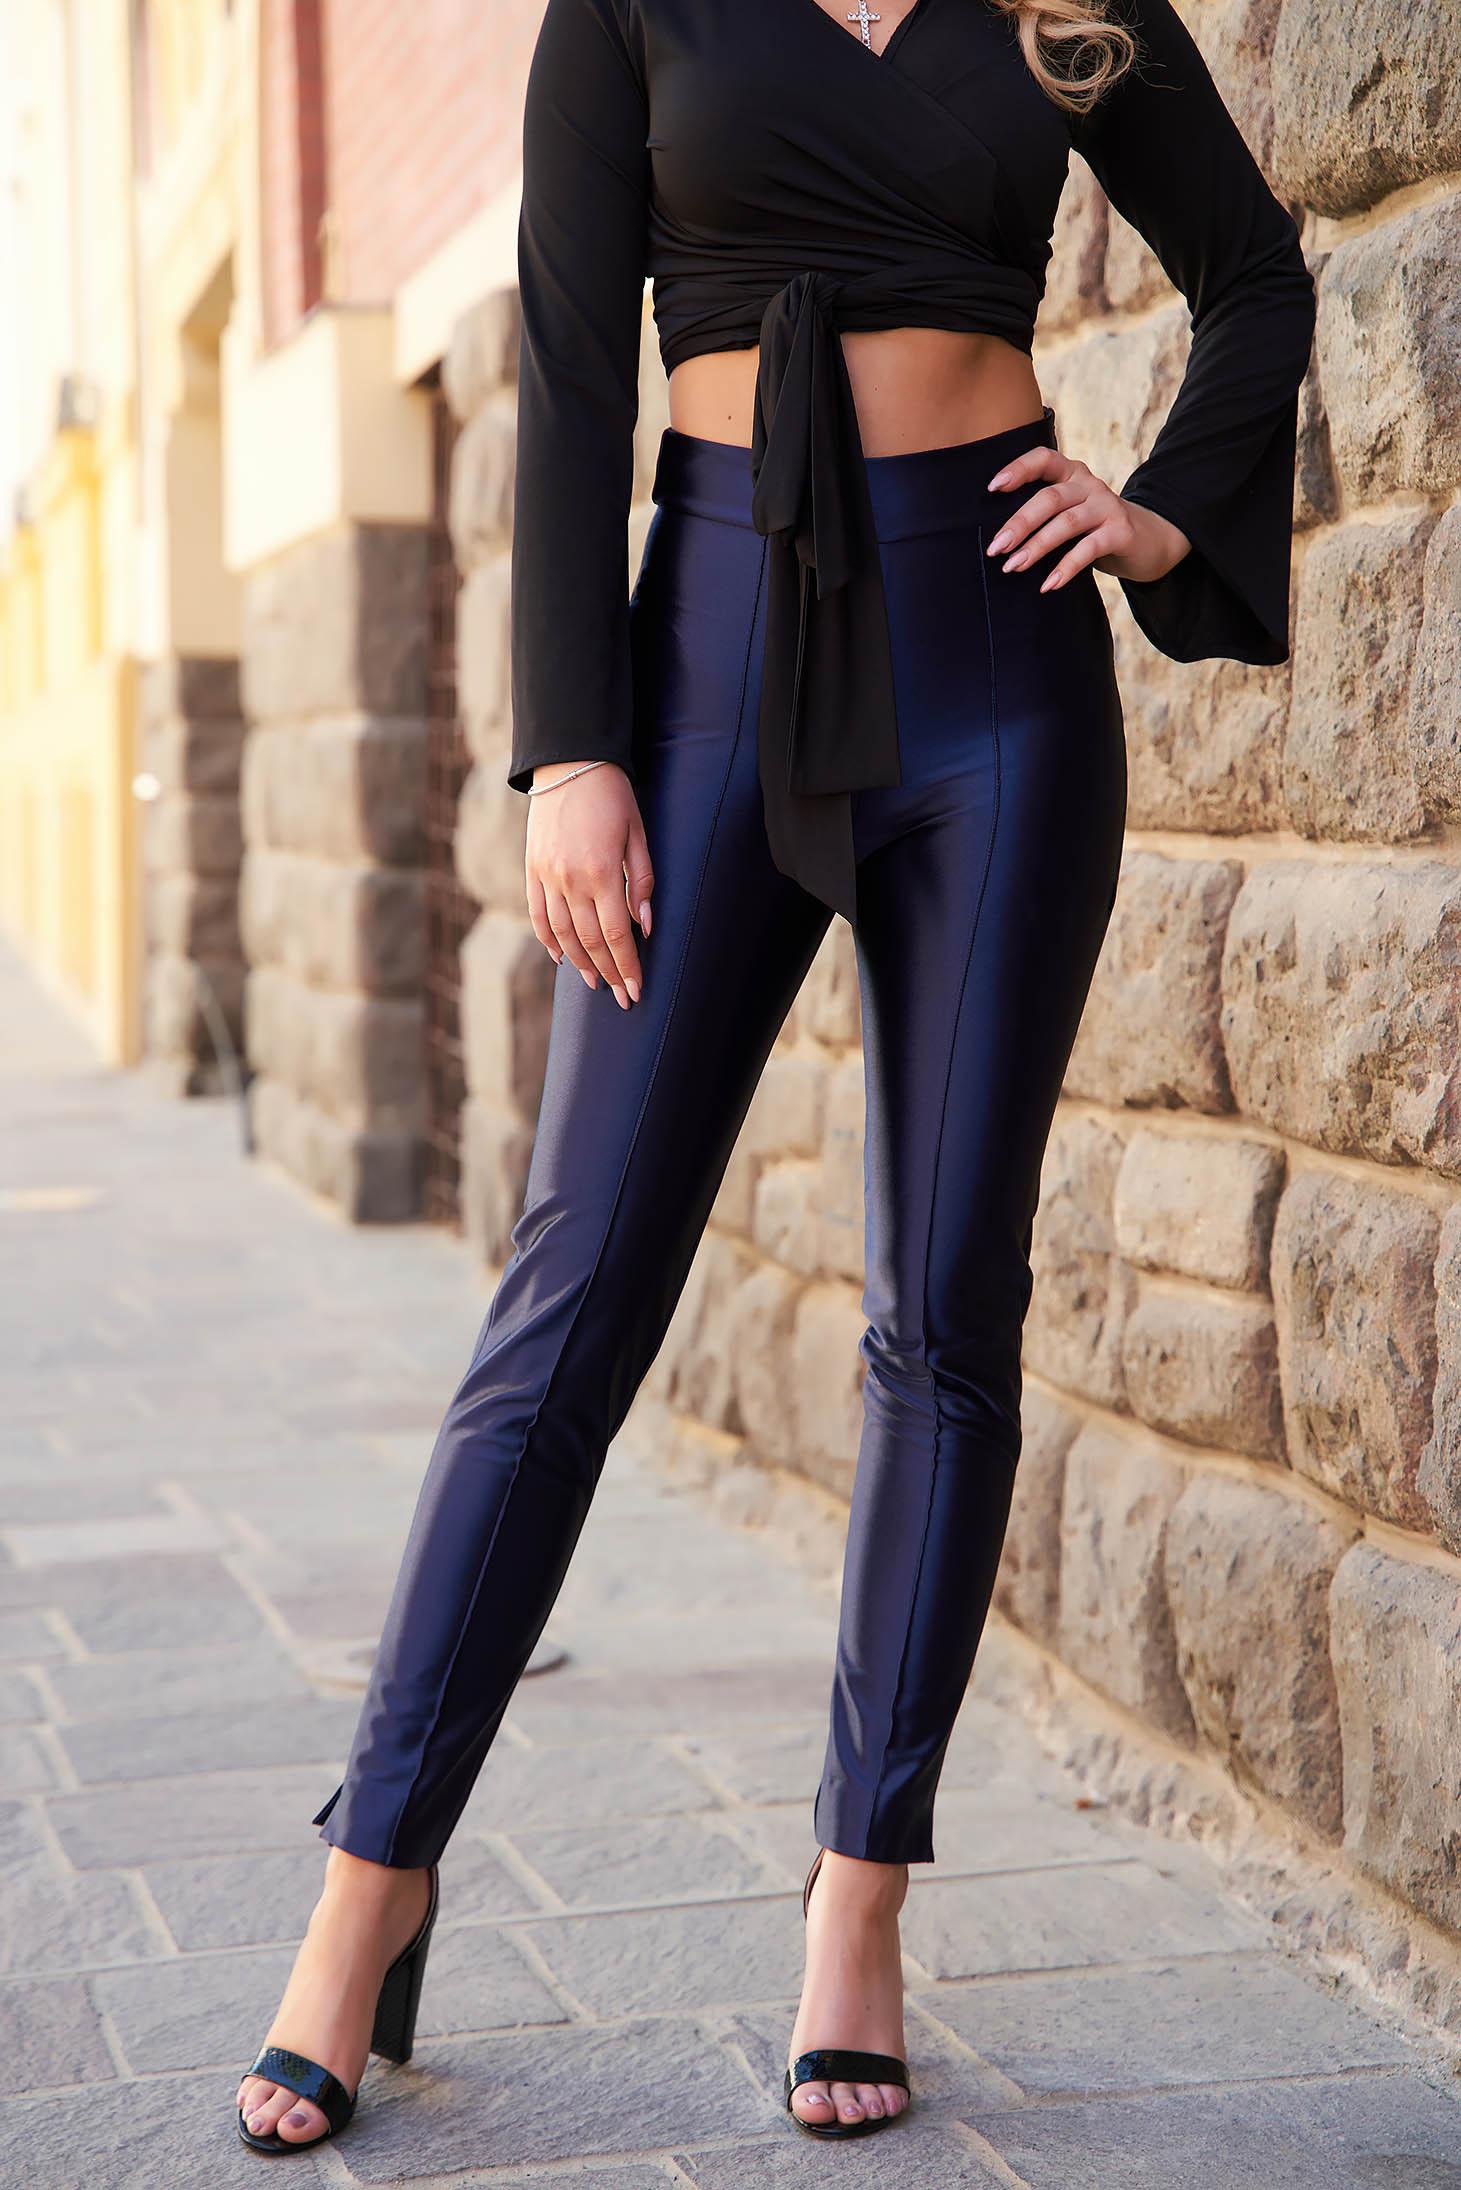 StarShinerS darkblue trousers slightly elastic fabric elegant conical